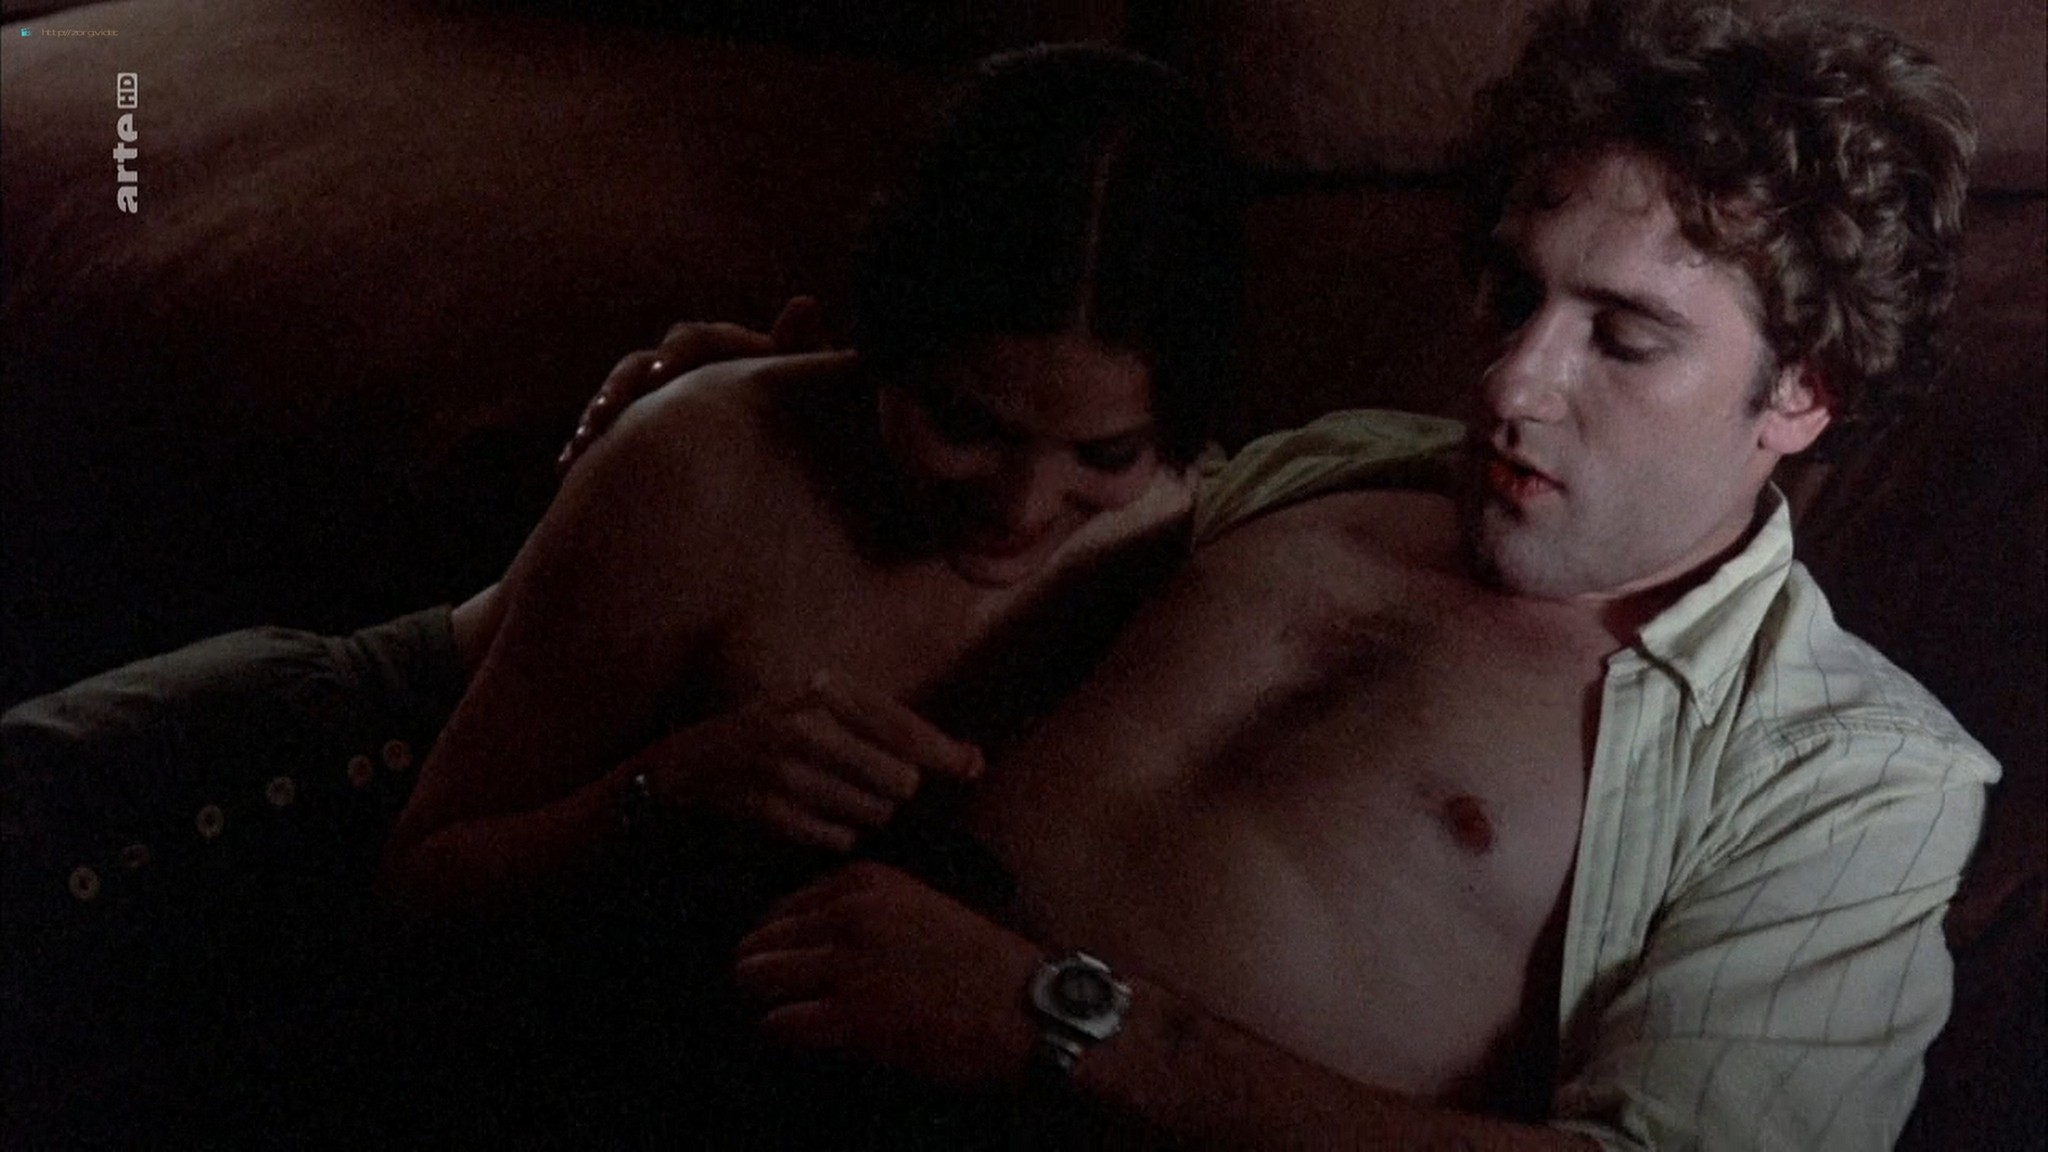 Ornella Muti nude full frontal - La dernière femme (1976) HDTV 1080p (7)